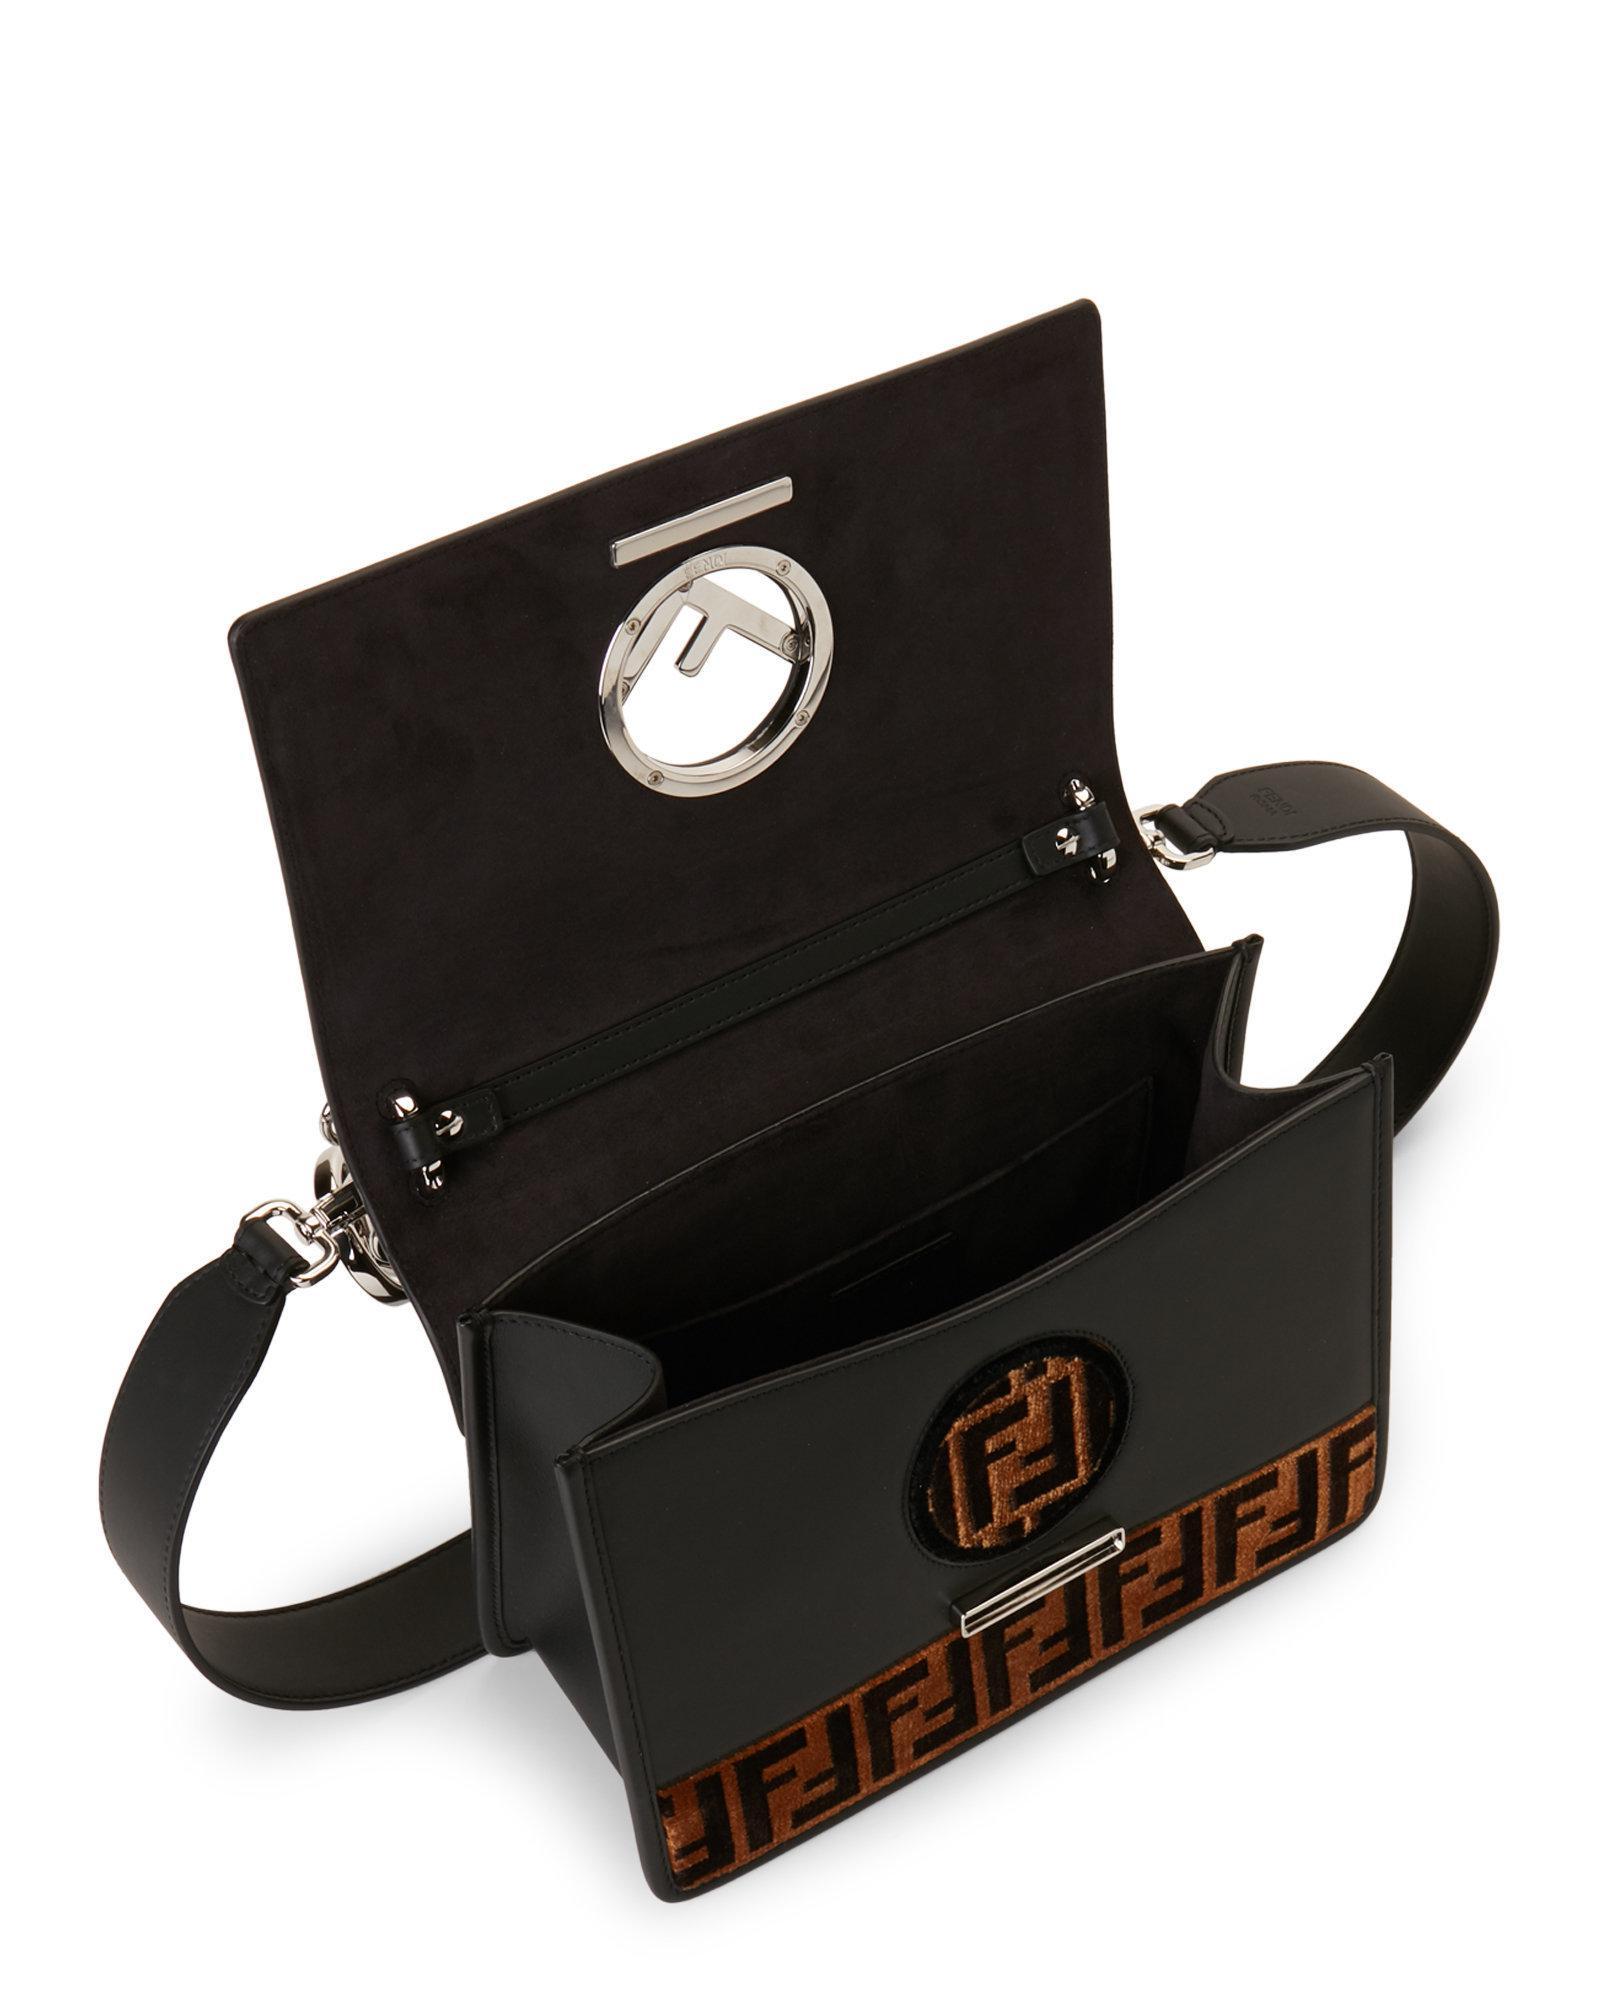 8bb16f2fdf Lyst - Fendi Black   Tobacco Kan I Logo Tappetino Leather Shoulder ...